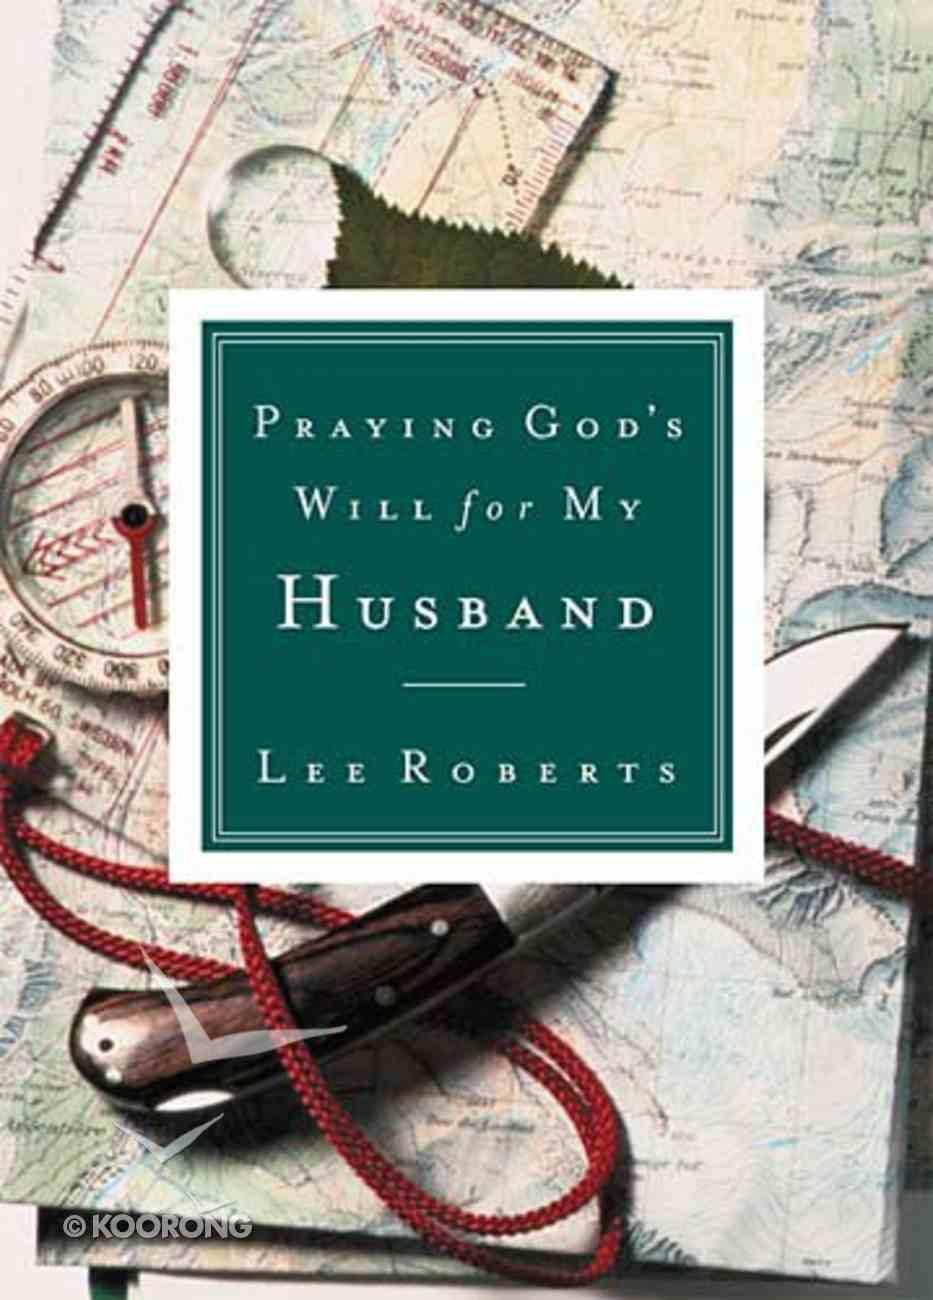 Praying God's Will For My Husband (Praying God's Will Series) Paperback